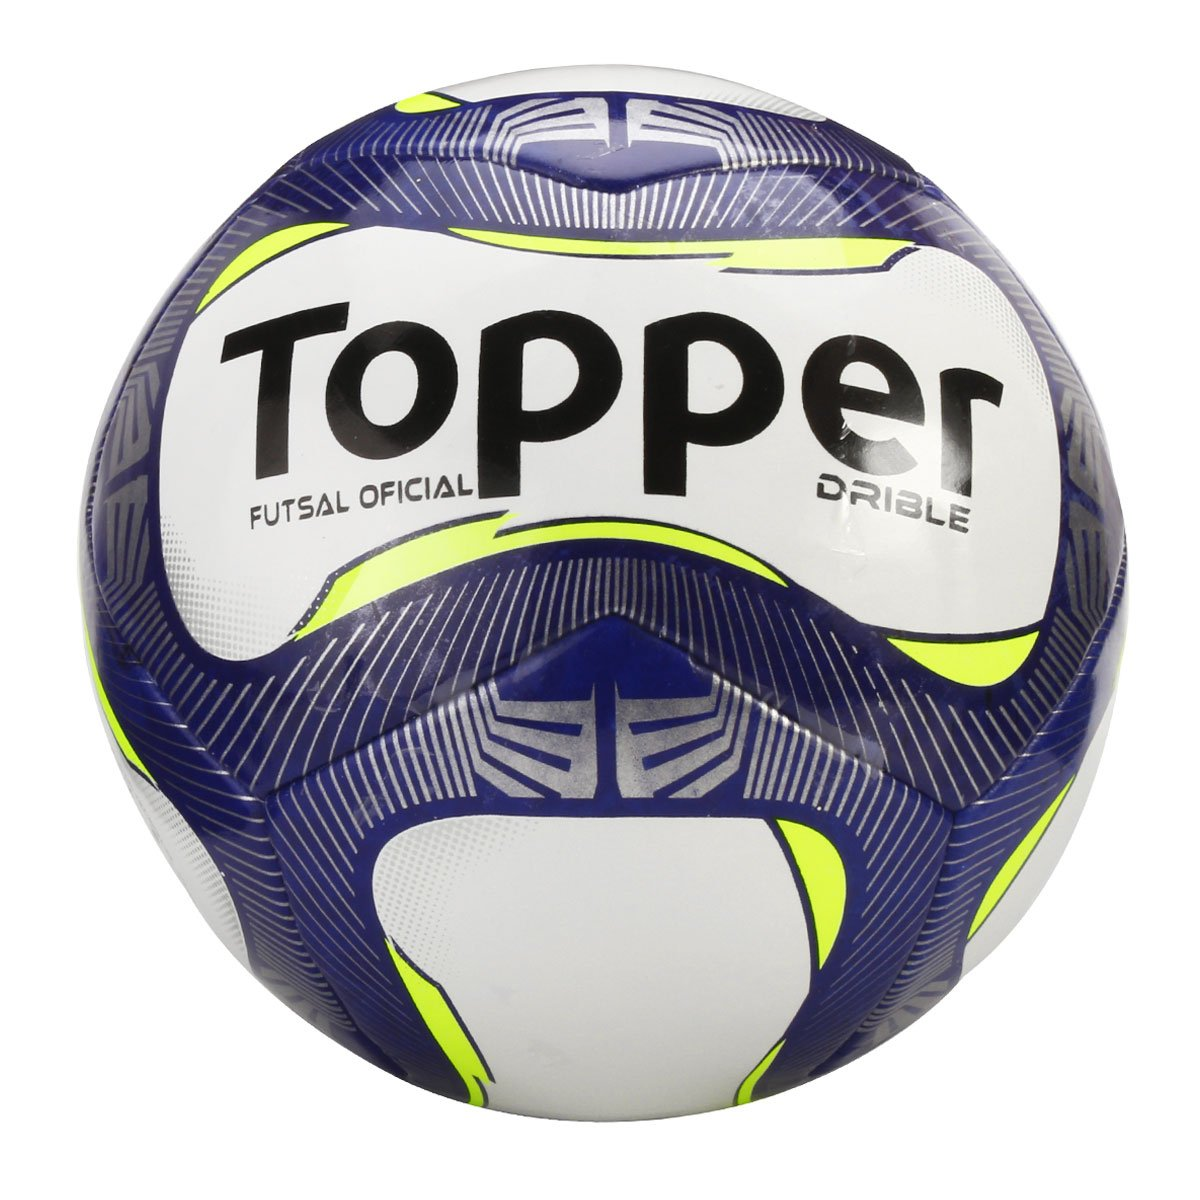 46a2681fe7033 Bola Topper Futsal Drible - Compre Agora